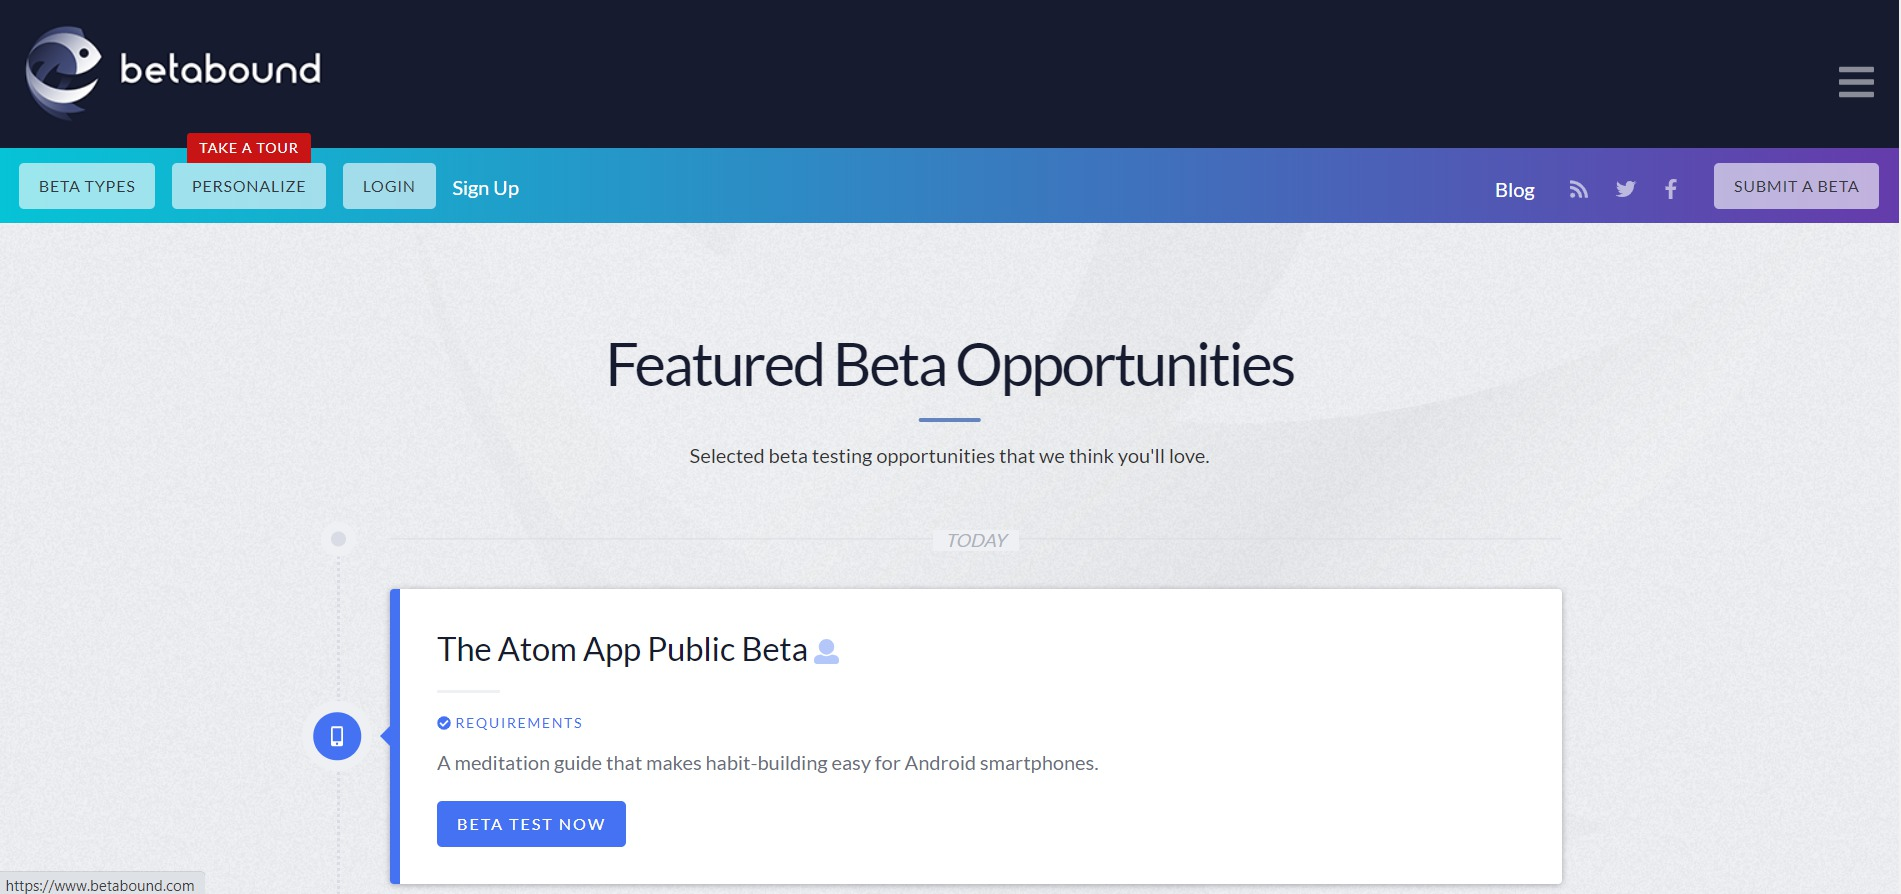 beta testing opportunities